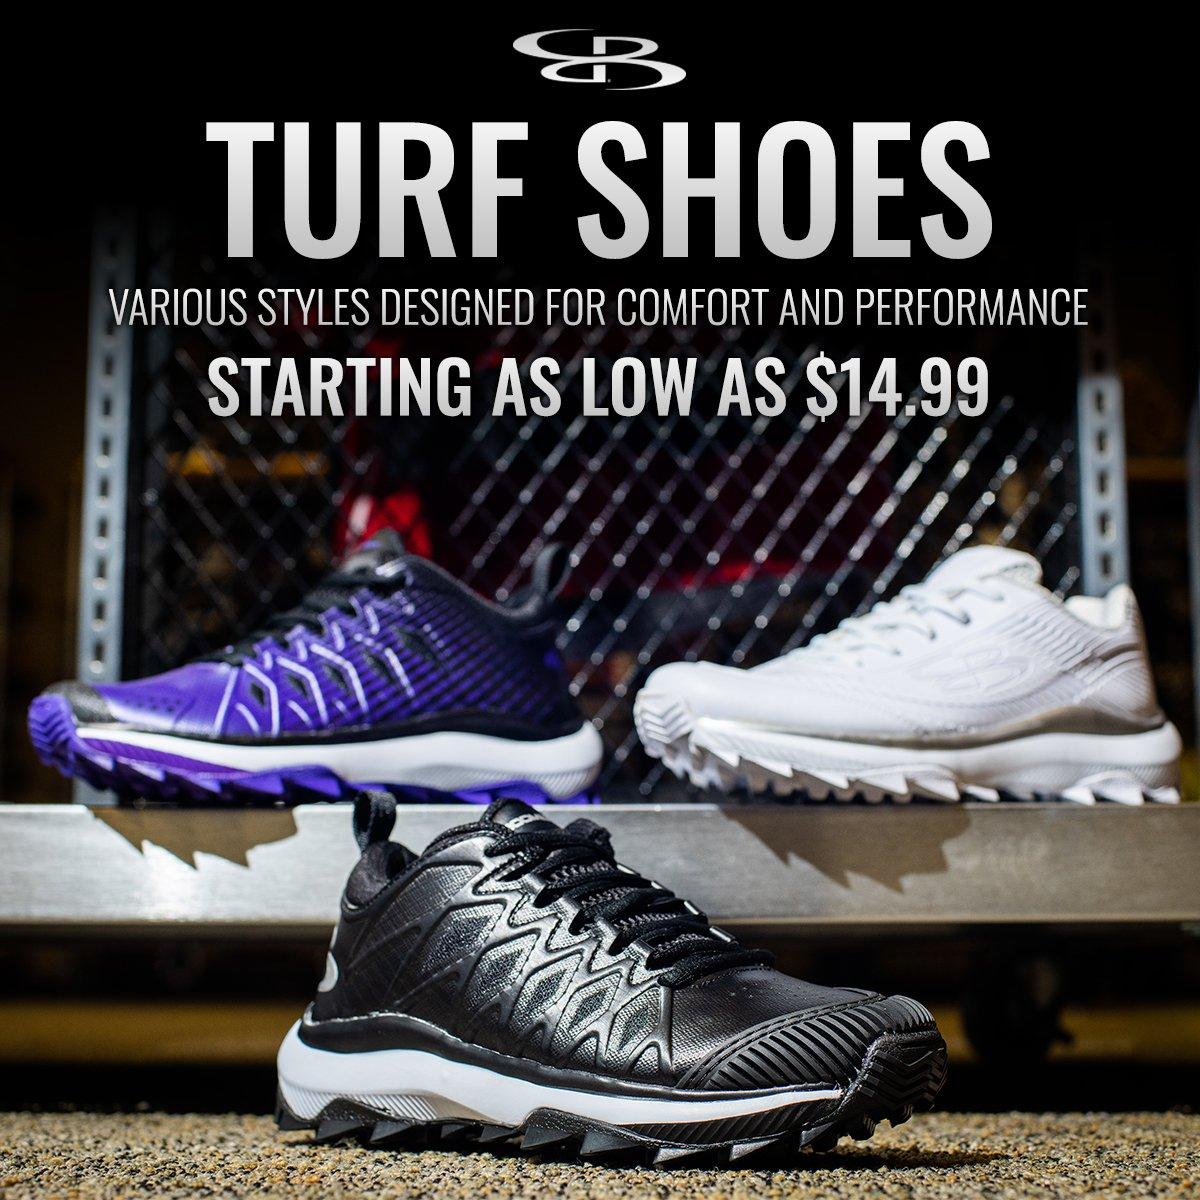 40303c5e4ec Shop Men s  https   bit.ly 2XXWlFZ Shop Women s  https   bit.ly 2Ty4ORU   Boombah  Shoes  Turfs  Footwear  TurfShoes  Baseball  Fastpitch  Slowpitch   USSSA ...